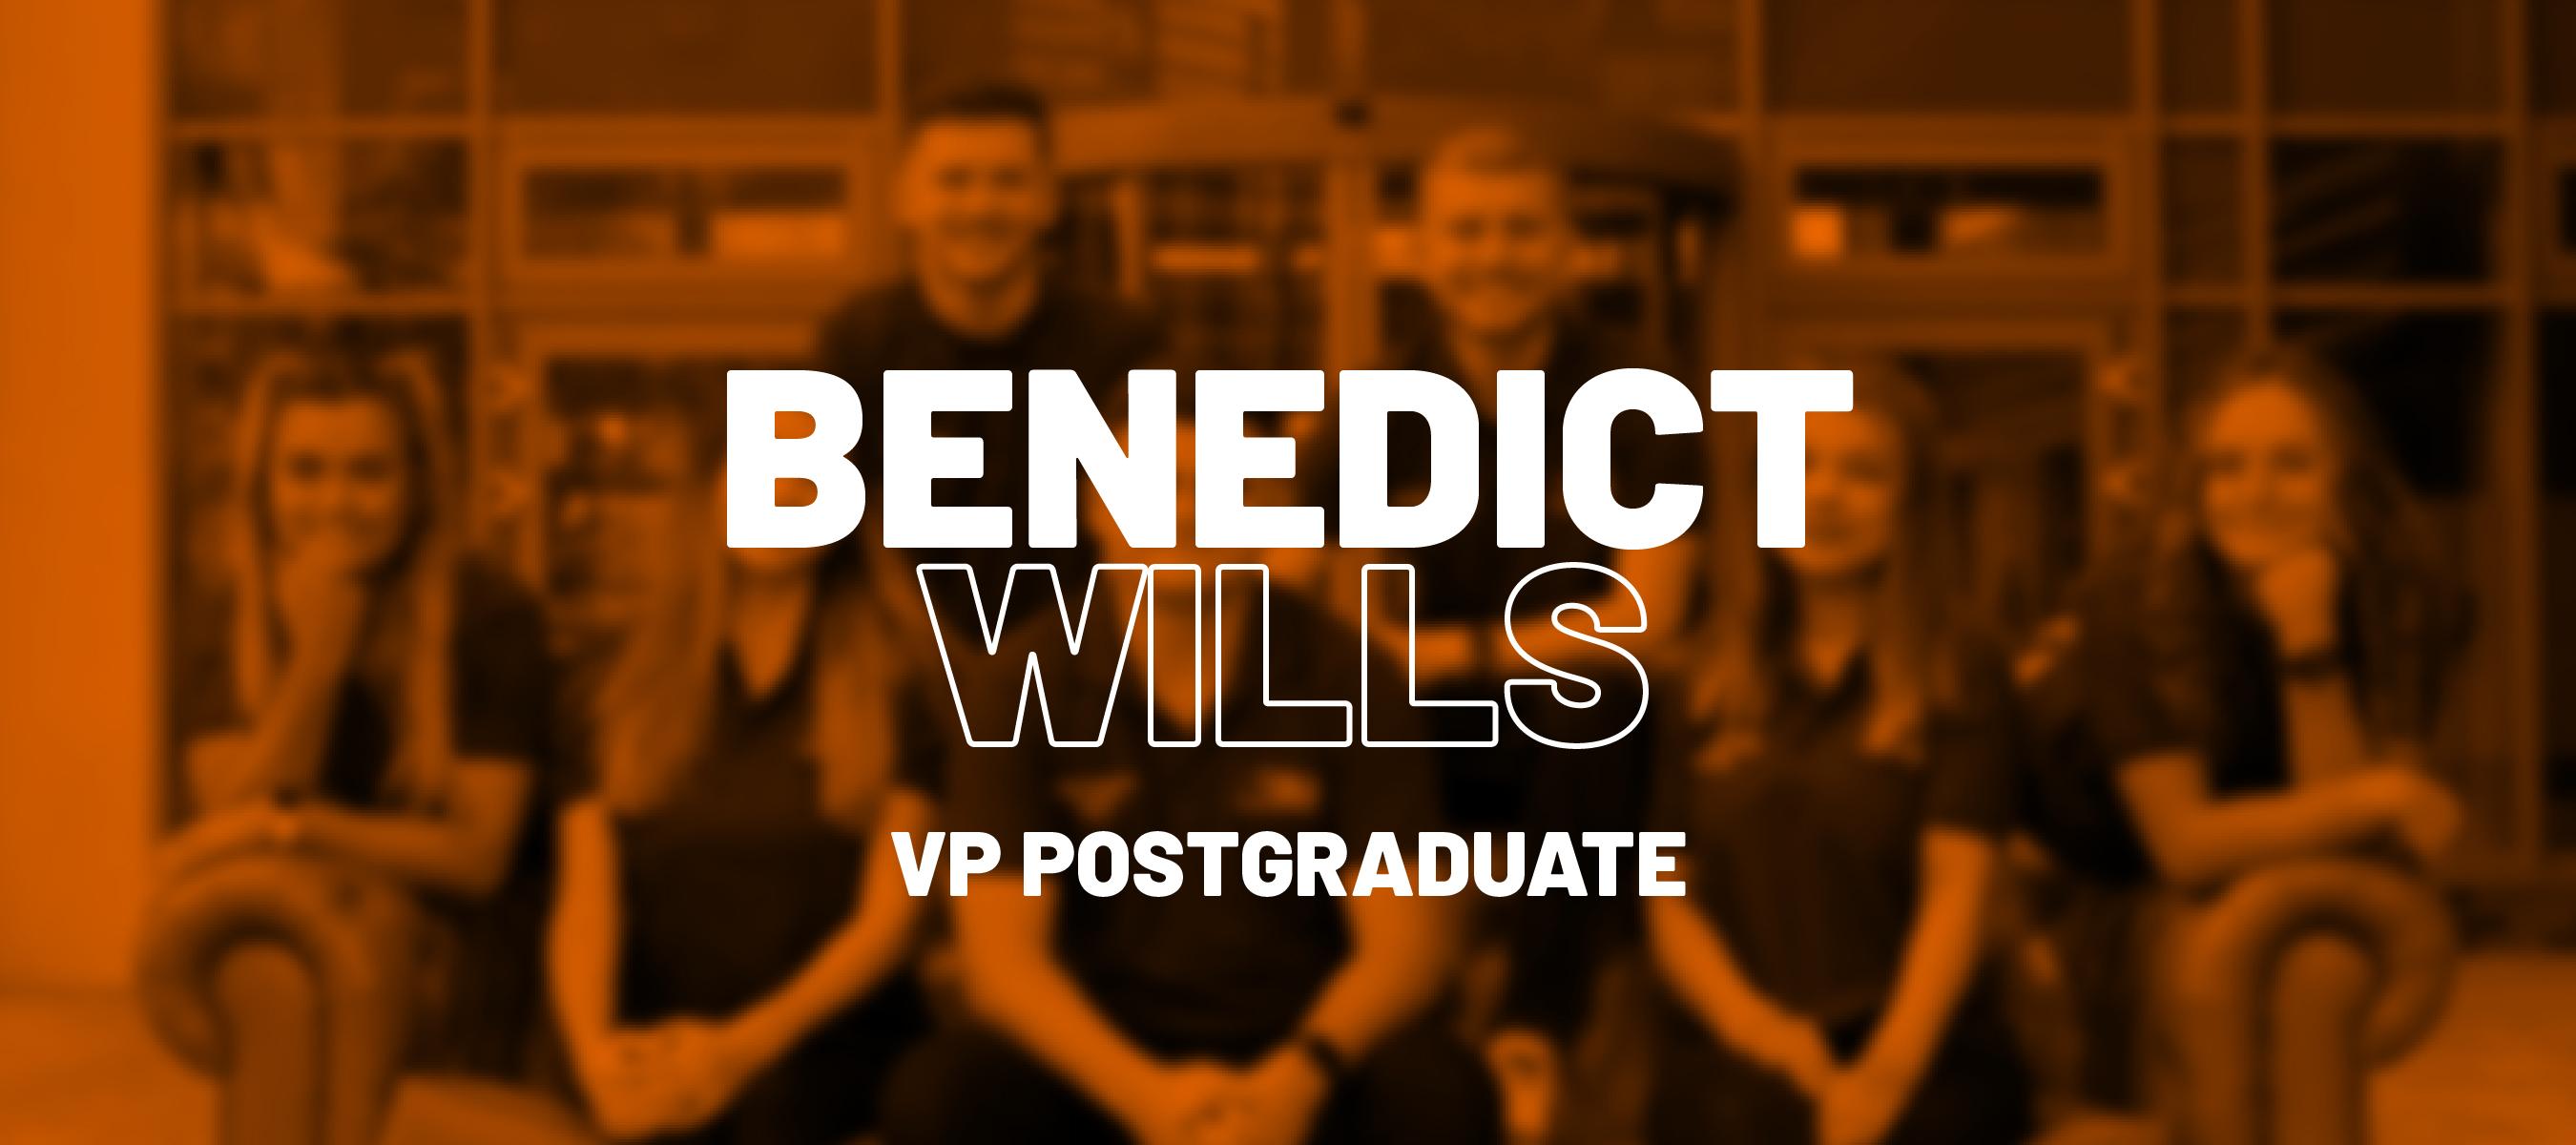 VP Postgraduate